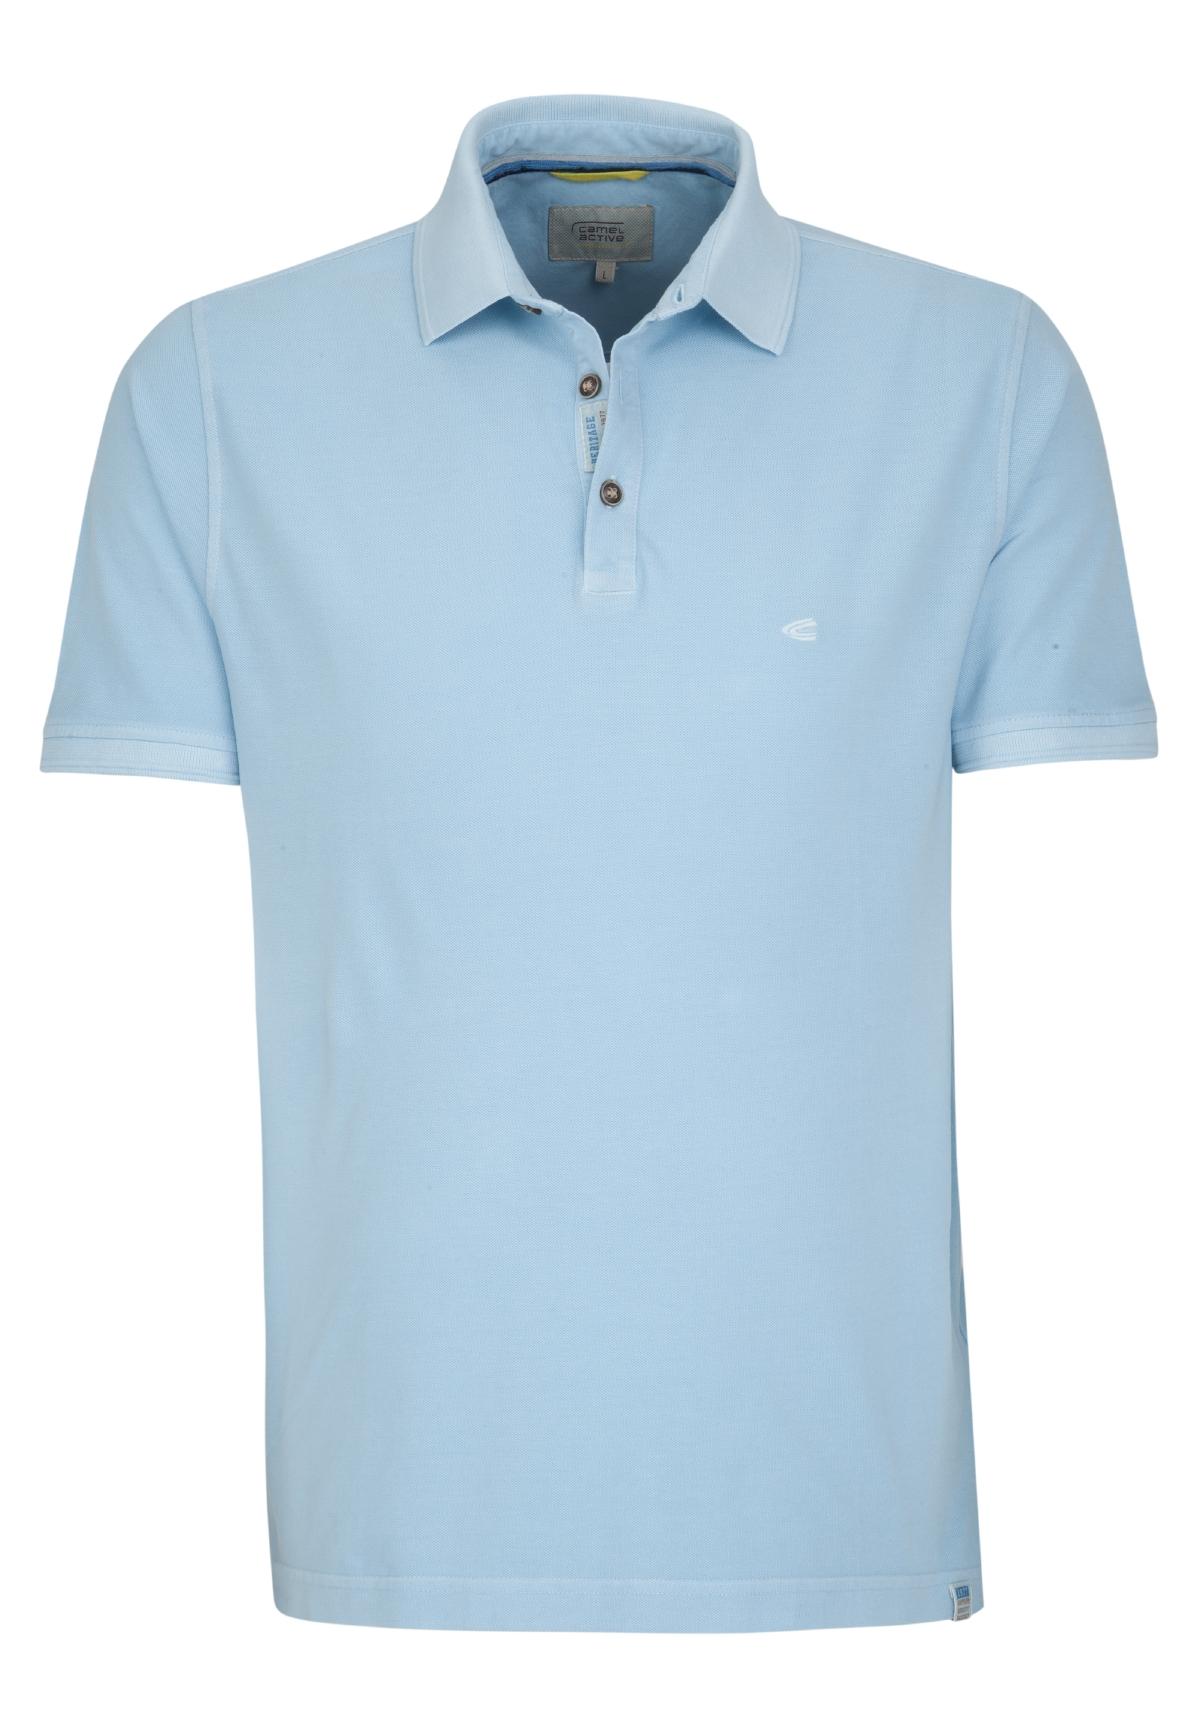 Camel-Active-Herren-Shirt-Poloshirt-Pique-Regular-Fit-NEU Indexbild 12